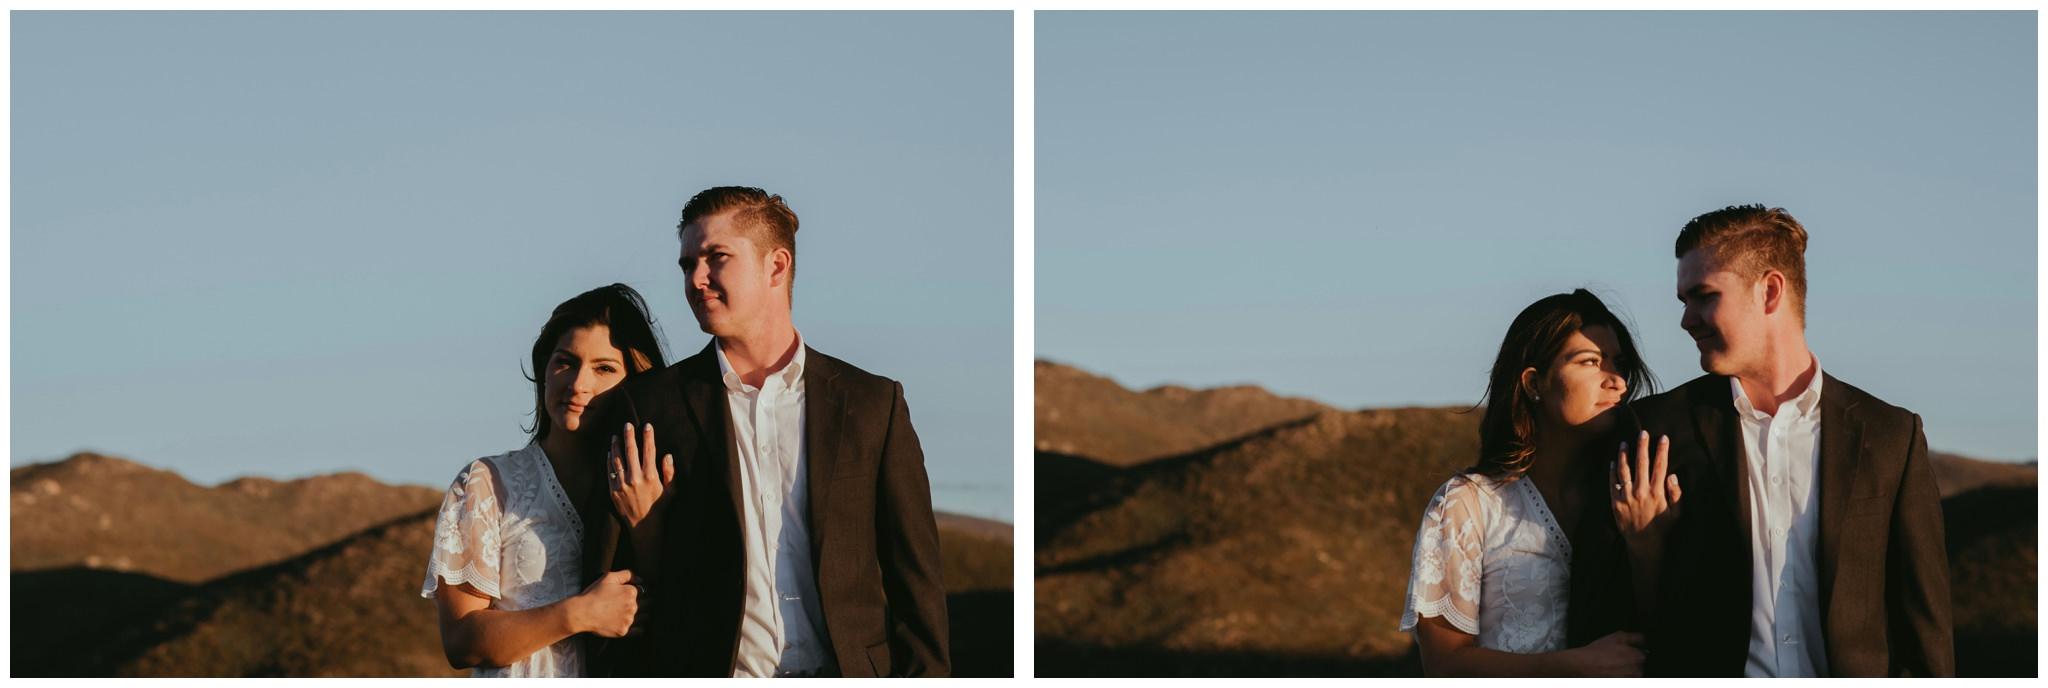 Mount_Laguna_Engagement_The_Singlers_0028.jpg